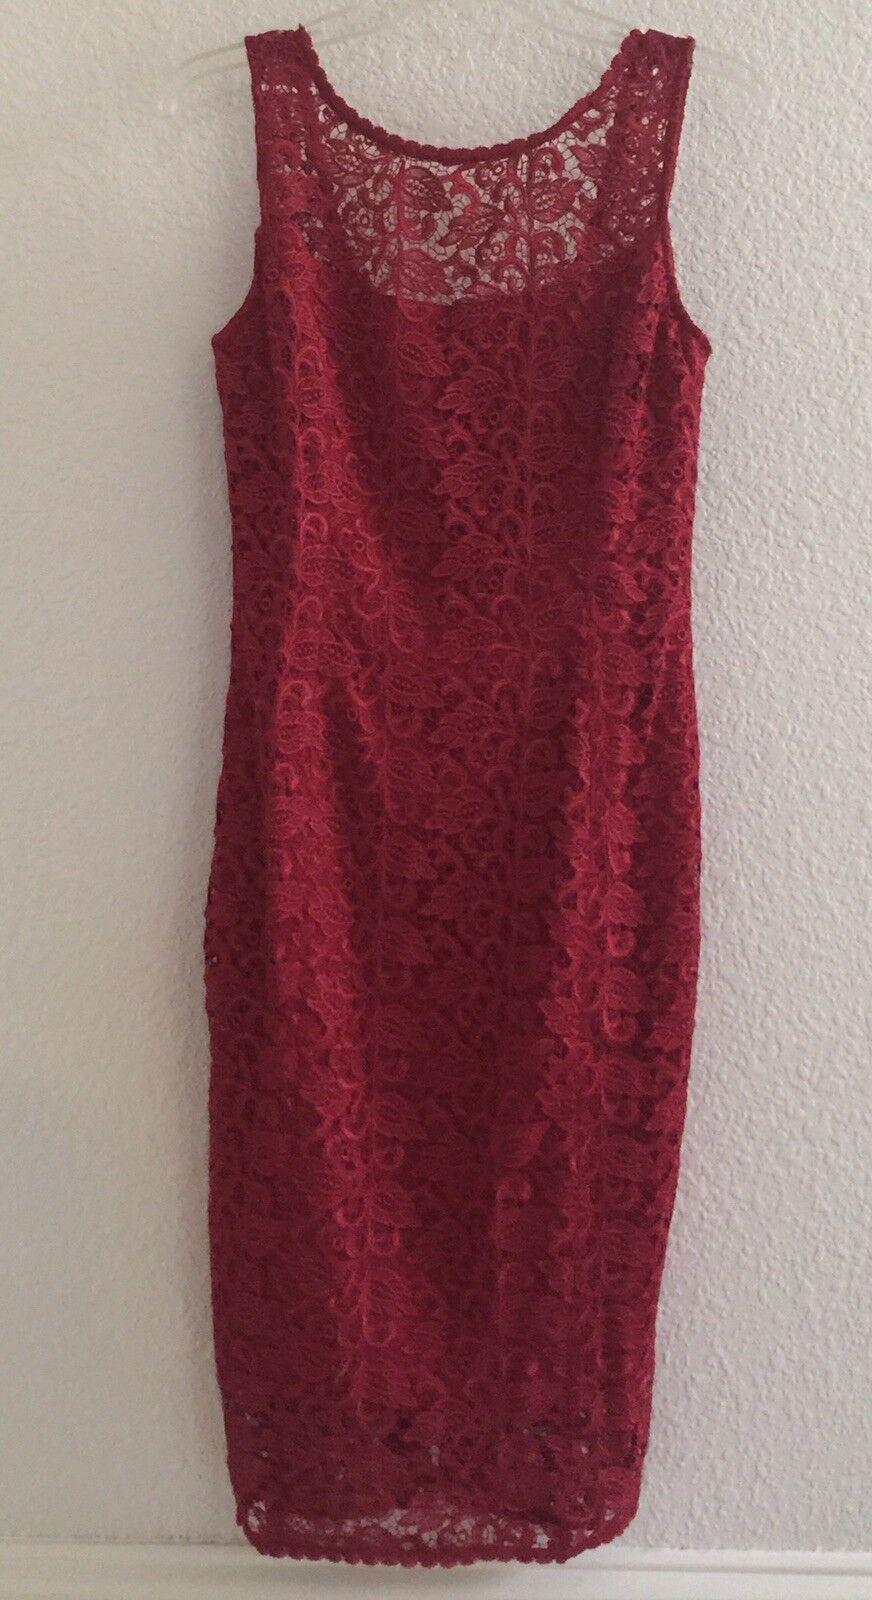 Weiß House schwarz Market Größe 10 rot Rosa Sleeveless Lace  Sheath Dress